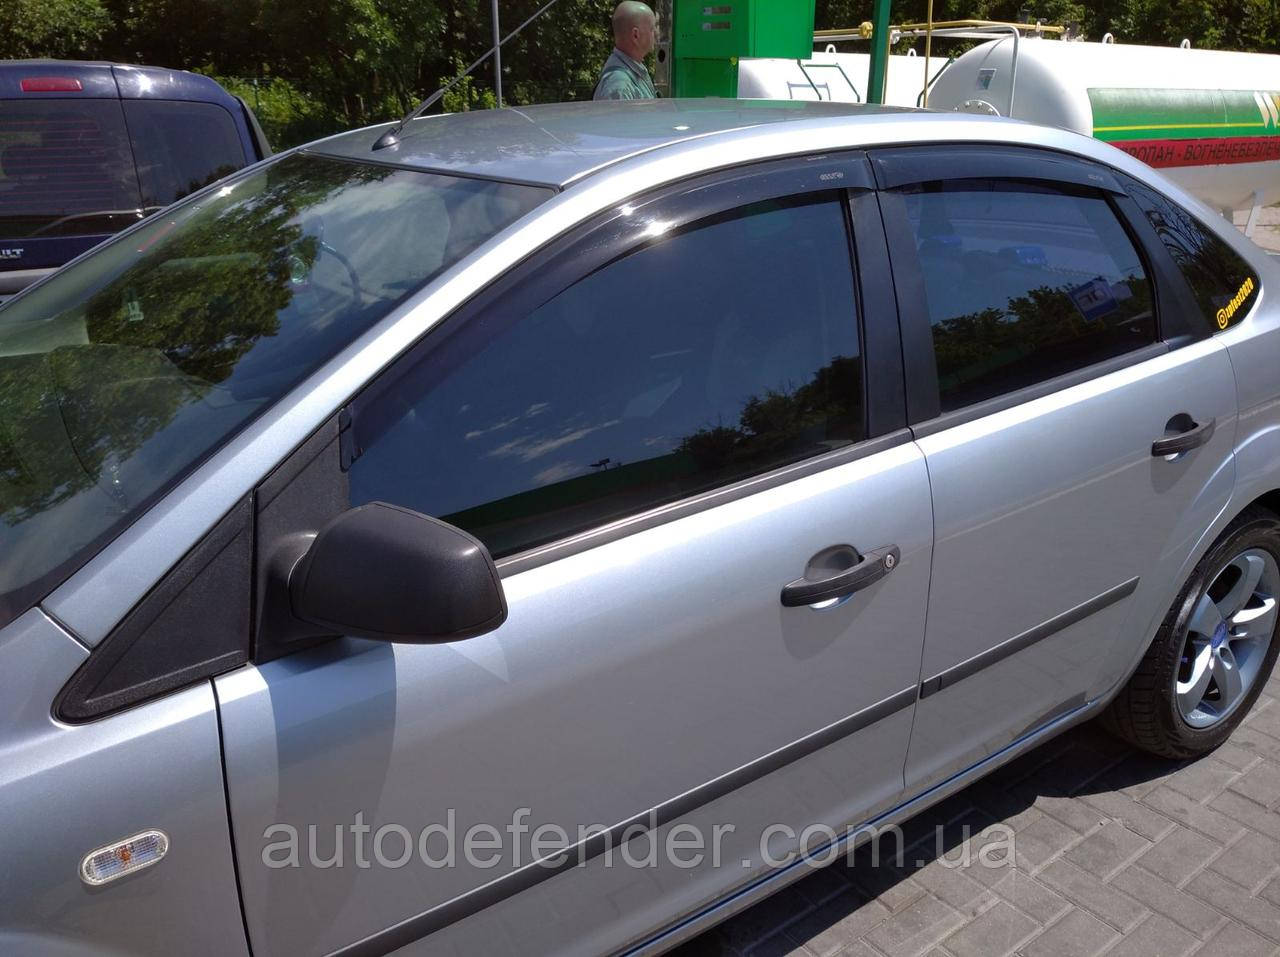 Дефлекторы окон (ветровики) Ford Mondeo III 2001-2006 hatchback/sedan, ANV - Cobra Tuning, F31301